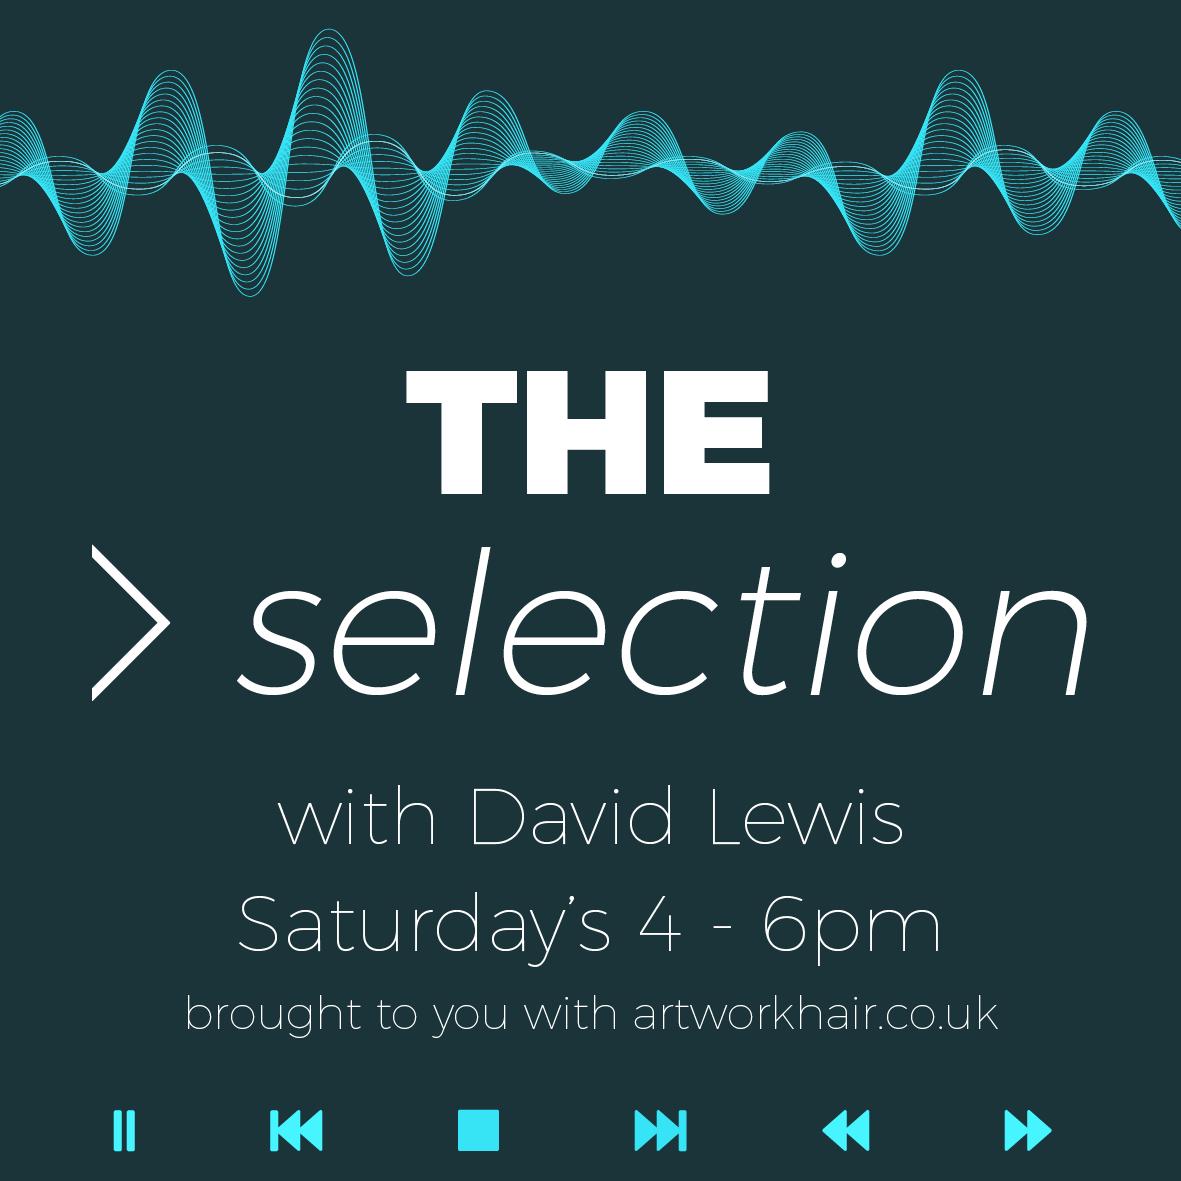 #TheSelection #SaturdayThoughts #SaturdayVibes @solarradio @ebenet @MusicByKEM @jodywatley @MacyGraysLife @LeelaJames @MicaParisSoul @angiestone @alisonlimerick1 @GBguitar @MAYSALEAK Podbean https://www.podbean.com/media/share/pb-zneb2-d48468… Mixcloud https://www.mixcloud.com/davidlewis315213/22-02-20-the-selection-with-artwork-hair-on-solar-radio-presented-by-david-lewis/… Apple https://itunes.apple.com/gb/podcast/masters-productions/id1123446957?mt=2…pic.twitter.com/ei2yjqAGMl